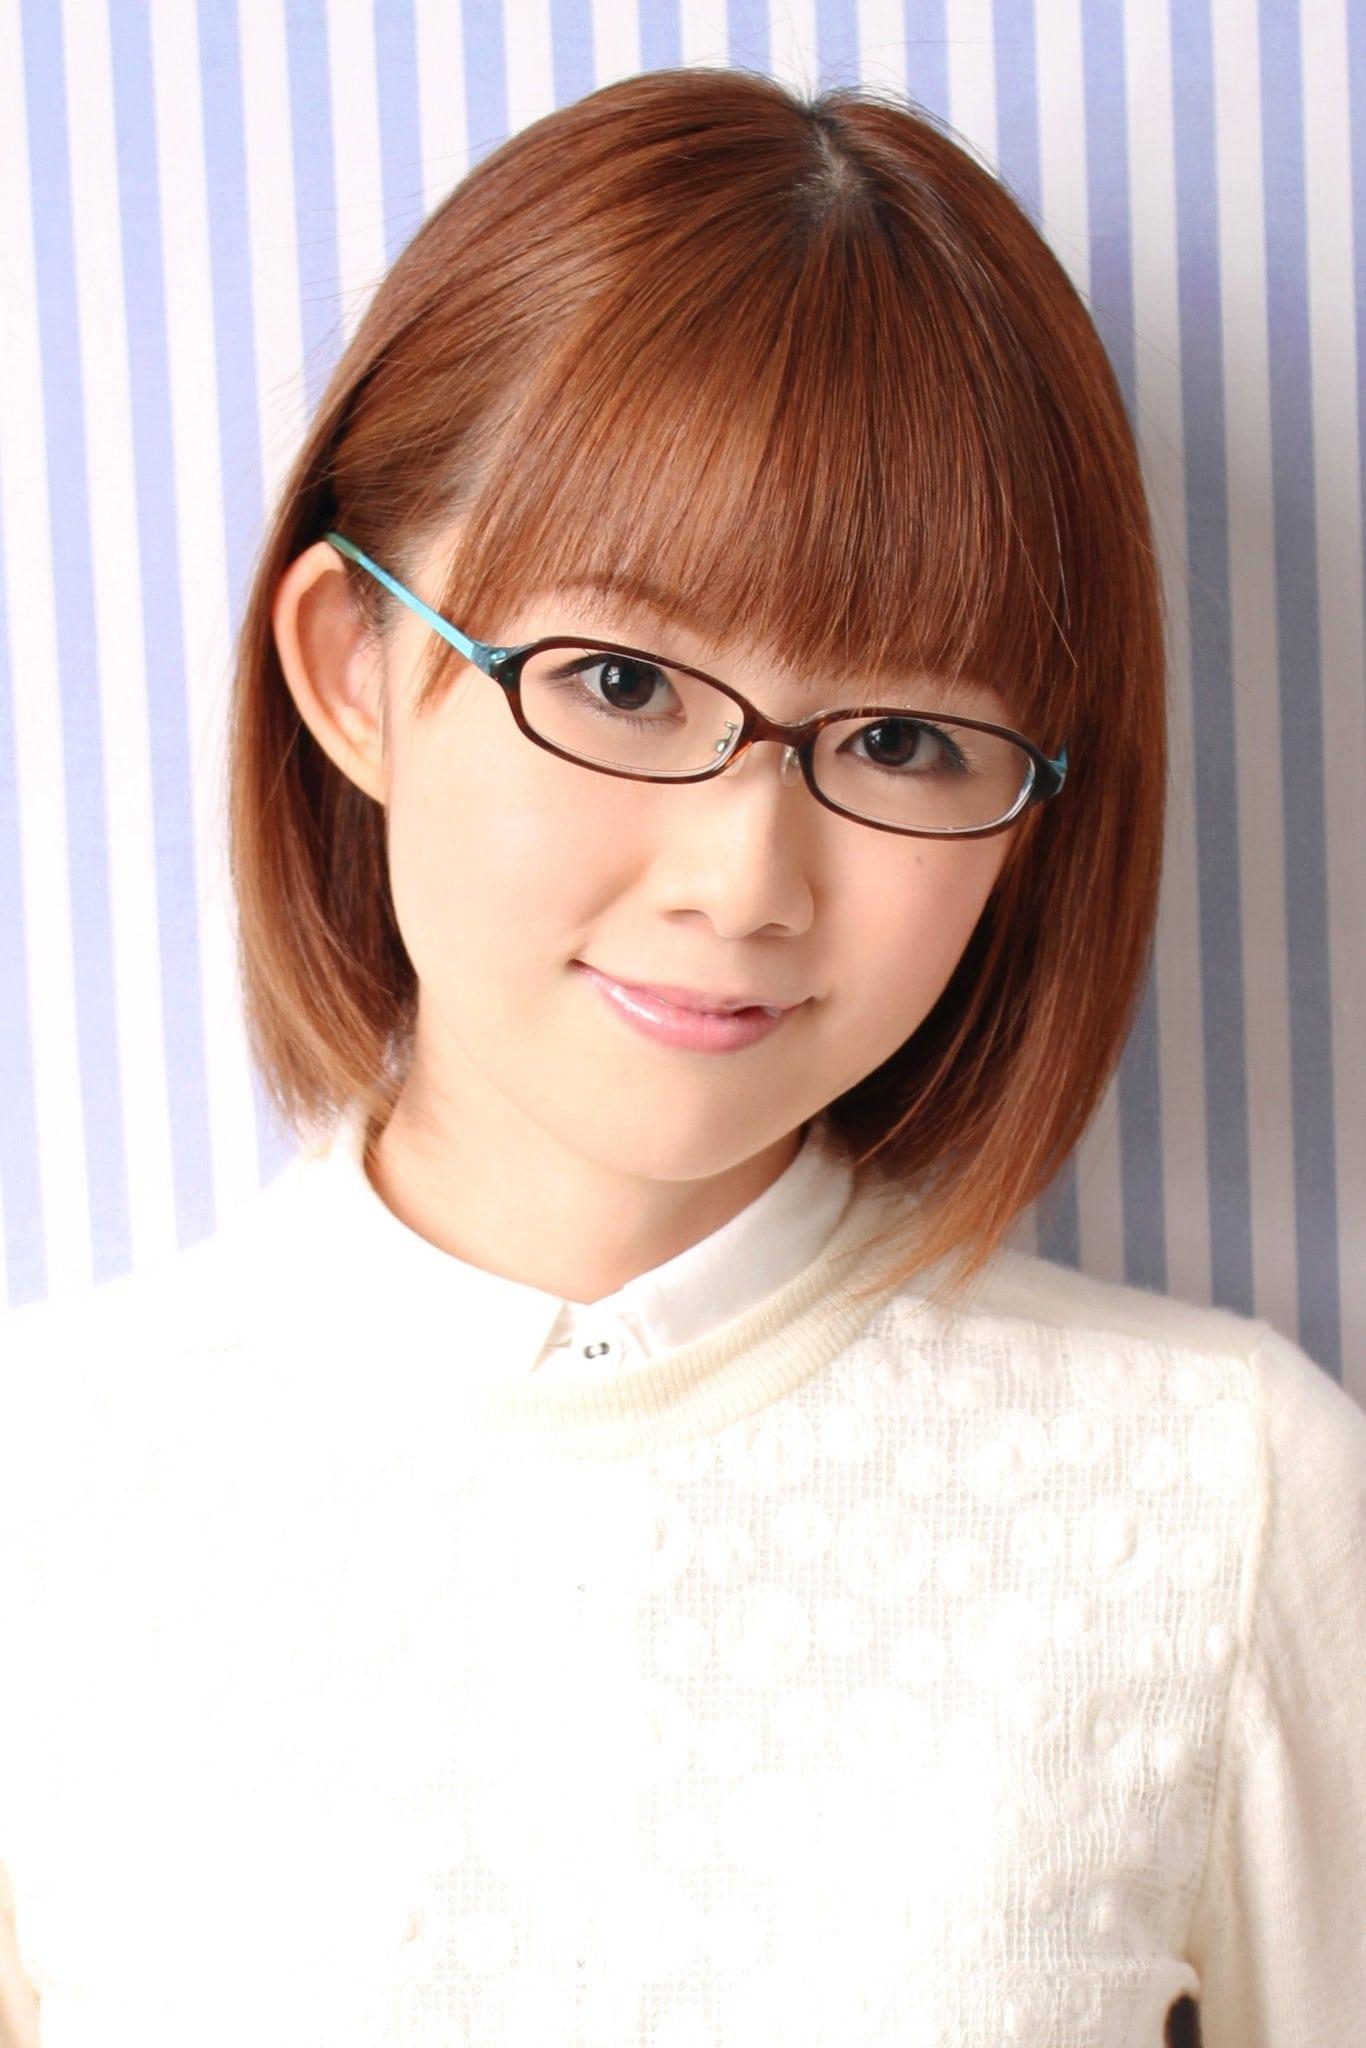 Mitsu Anzu